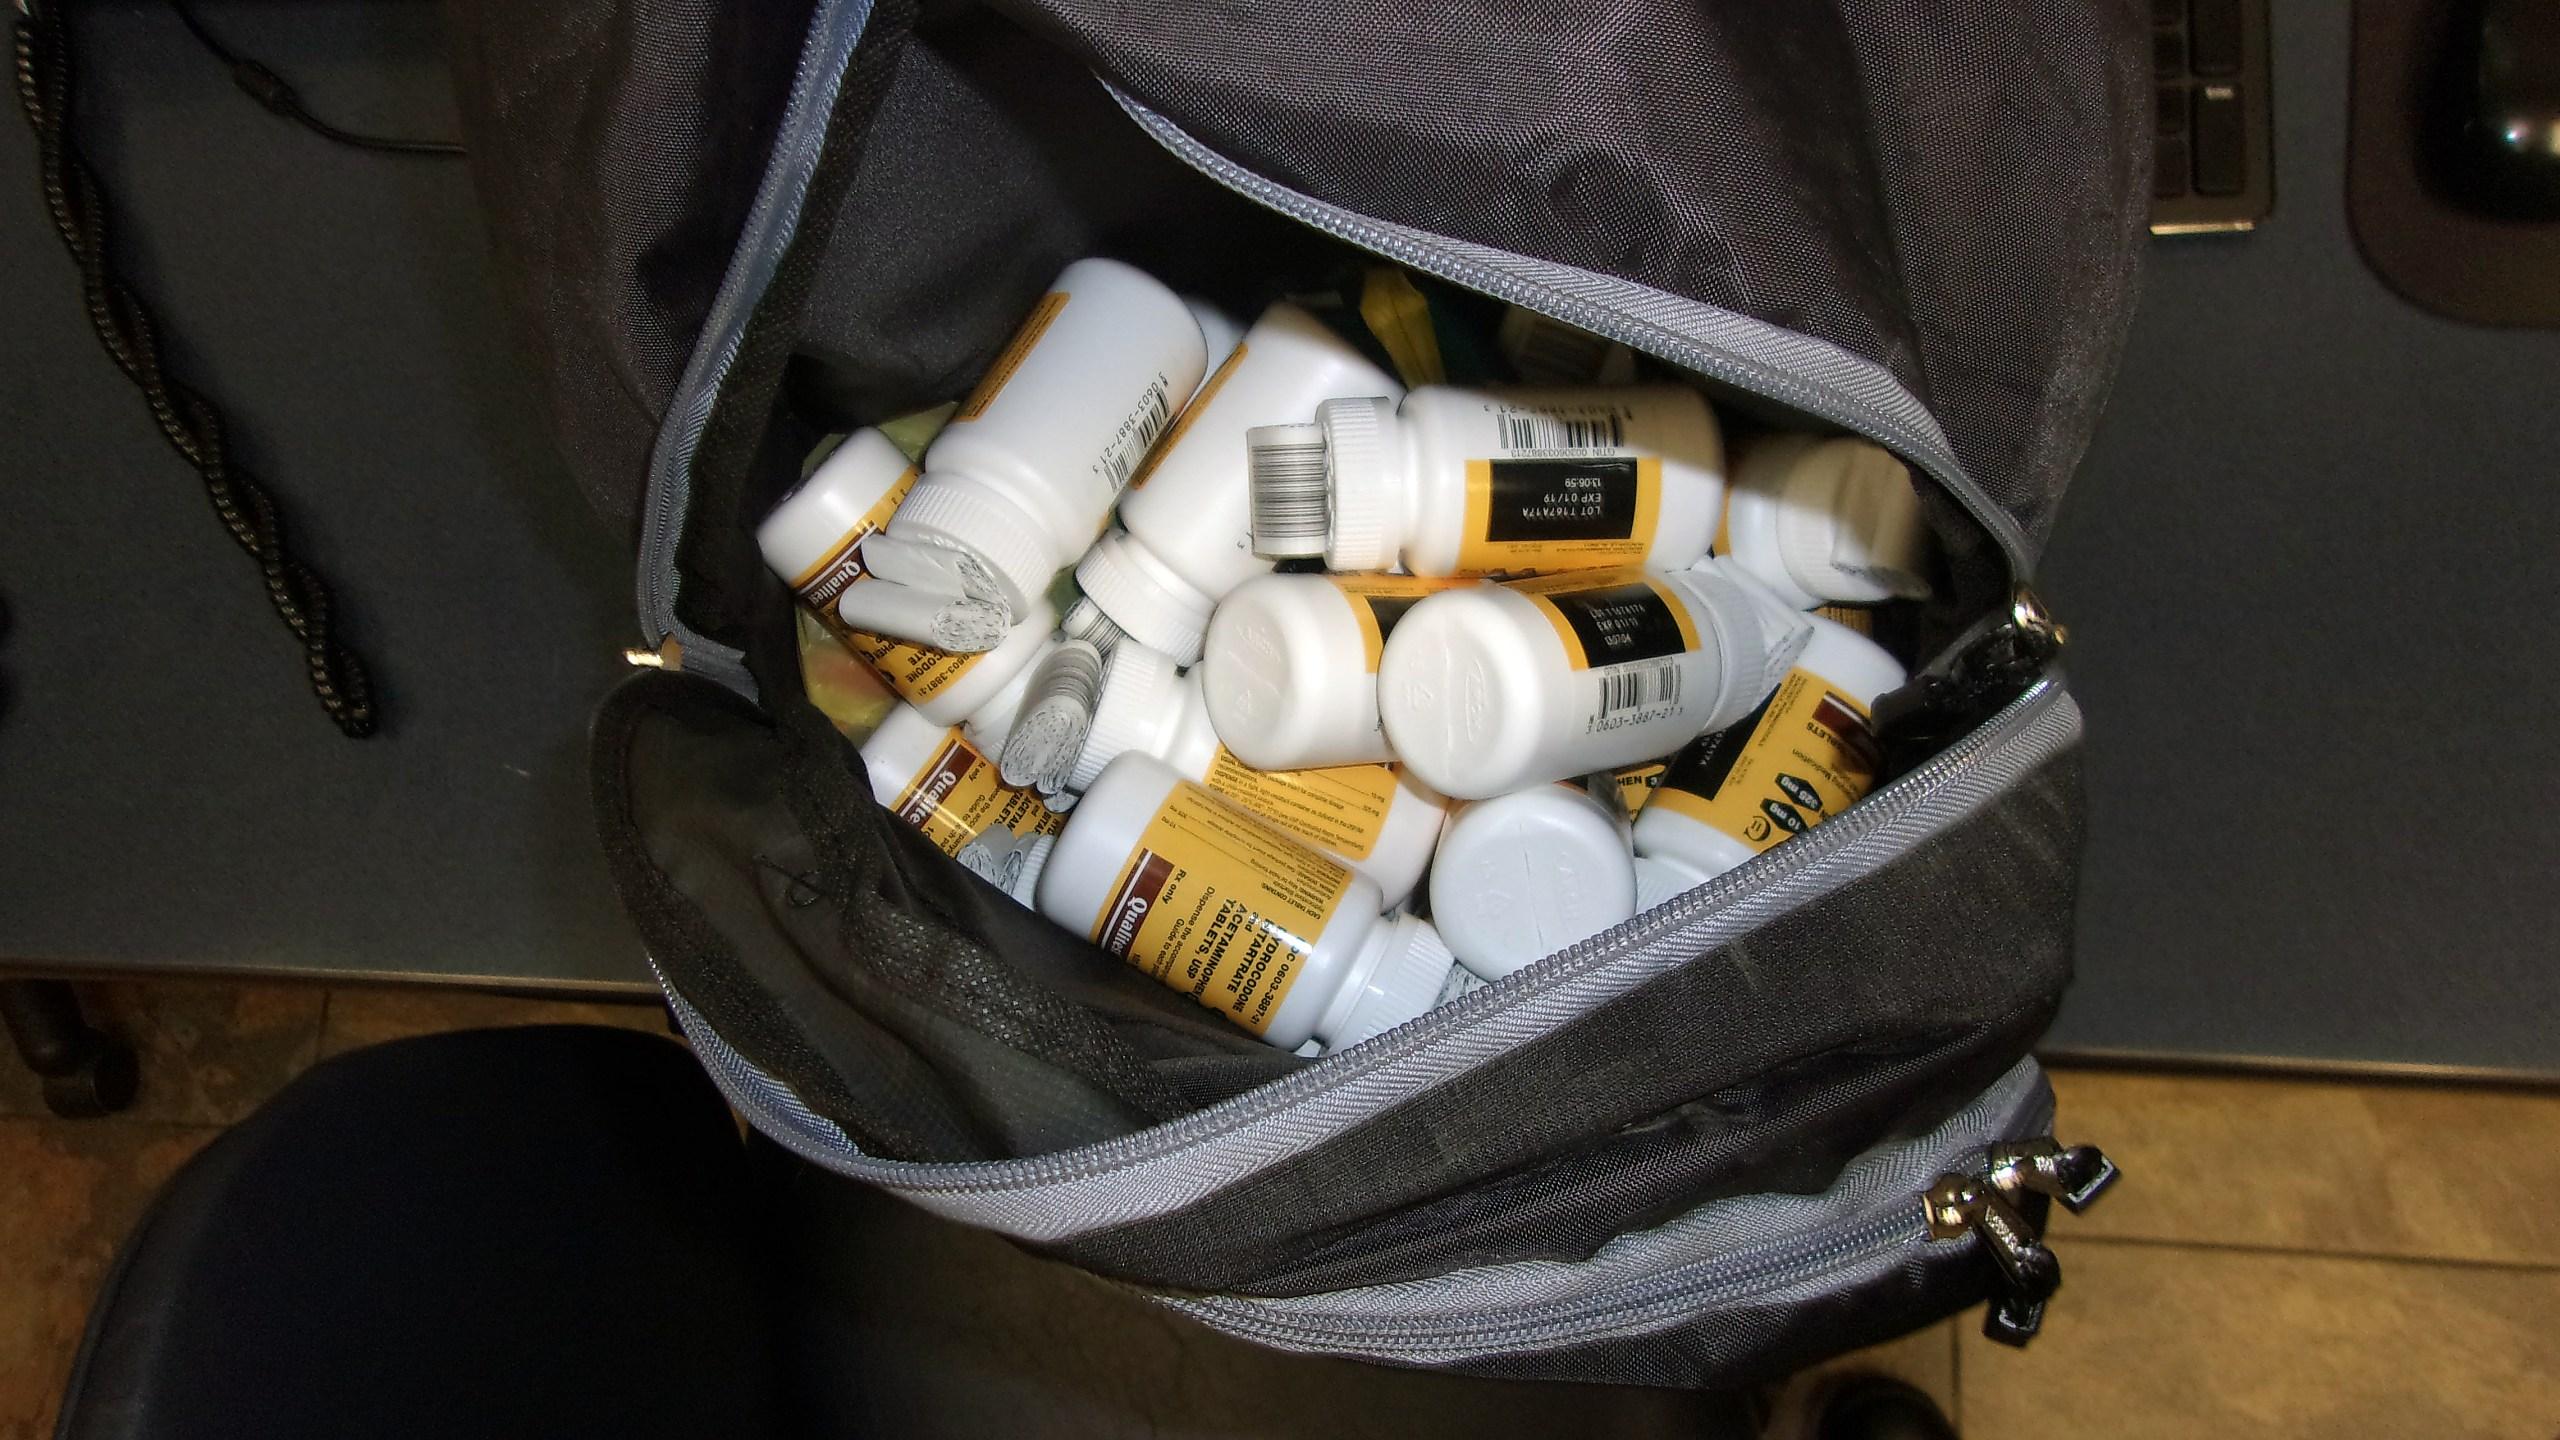 Warsaw CVS pharmacy robbery prescription drugs_271772